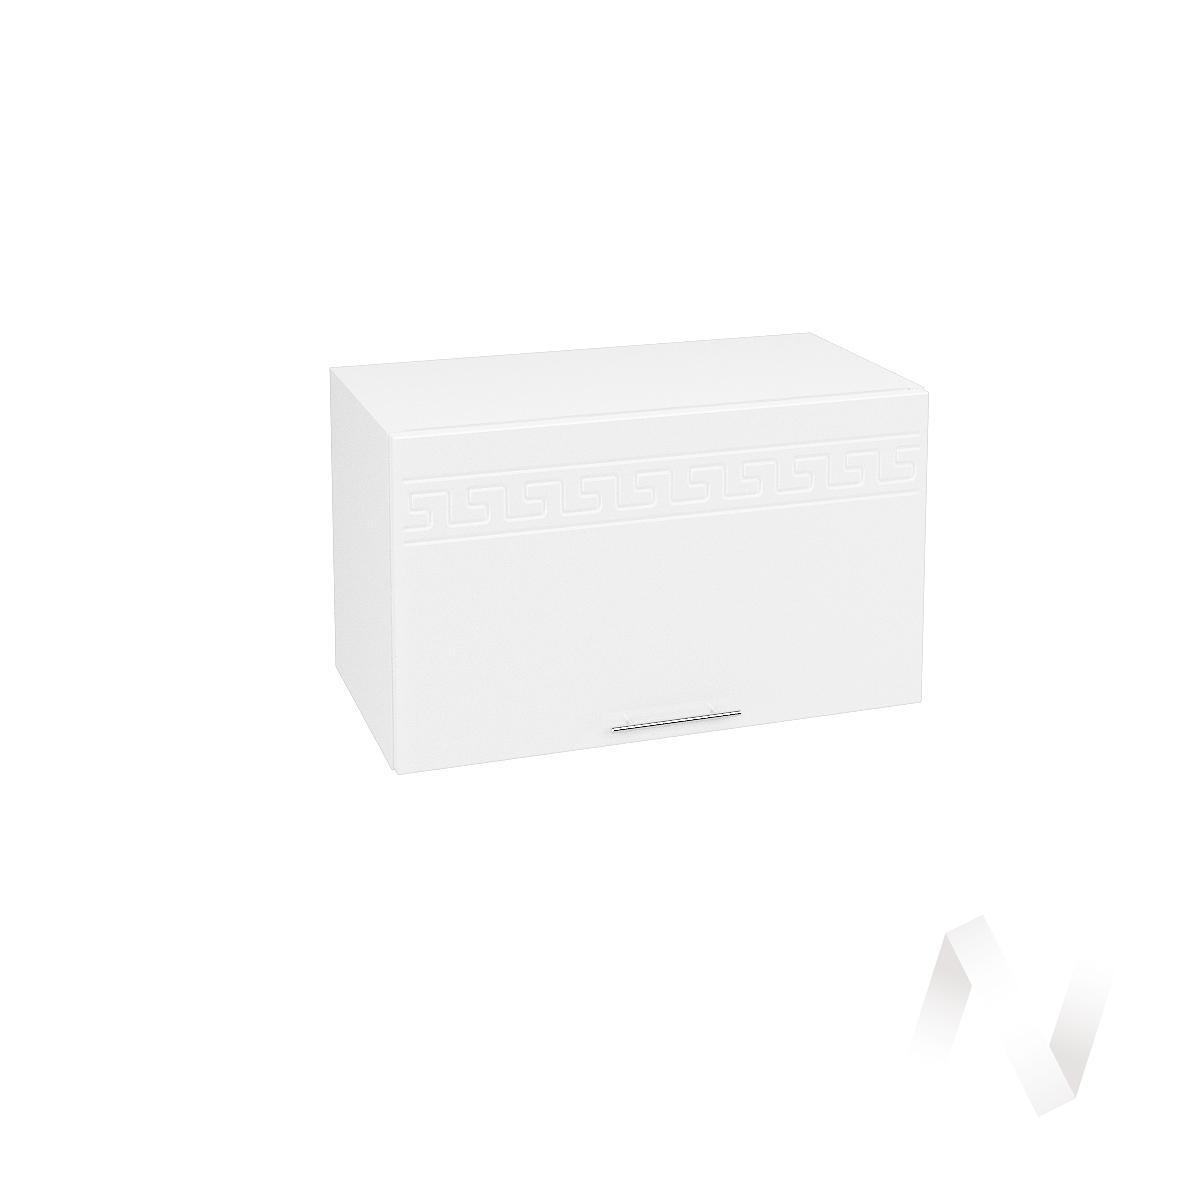 "Кухня ""Греция"": Шкаф верхний горизонтальный 600, ШВГ 600 (белый металлик/корпус белый)"